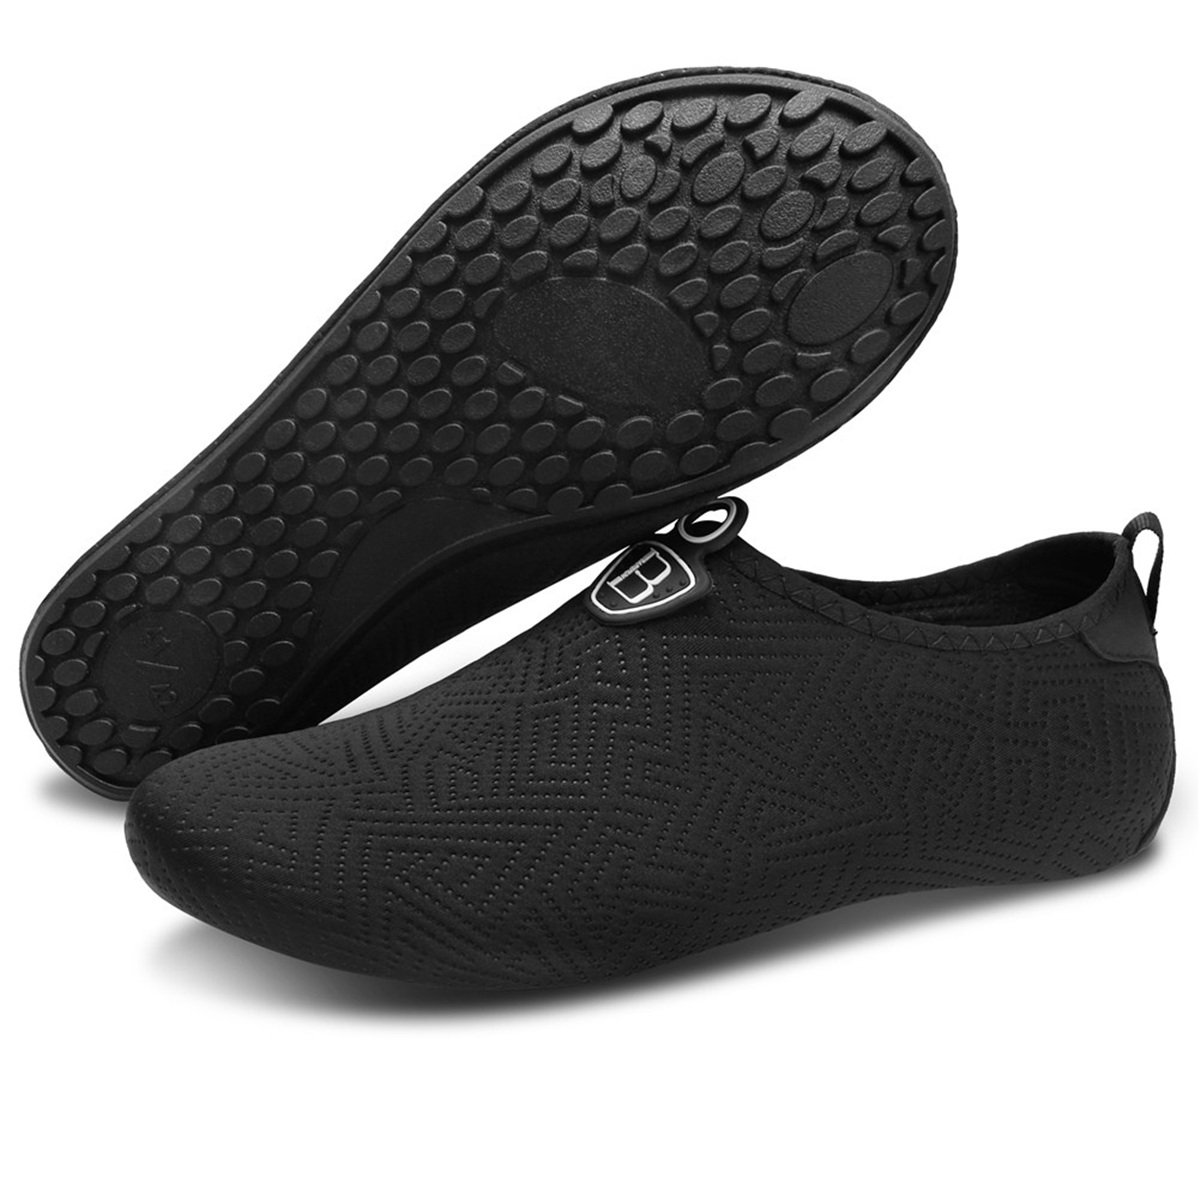 Barerun Barefoot Quick-Dry Water Sports Shoes Aqua Socks for Swim Beach Pool Surf Yoga for Women Men XXL(W:12-13,M:10-11)